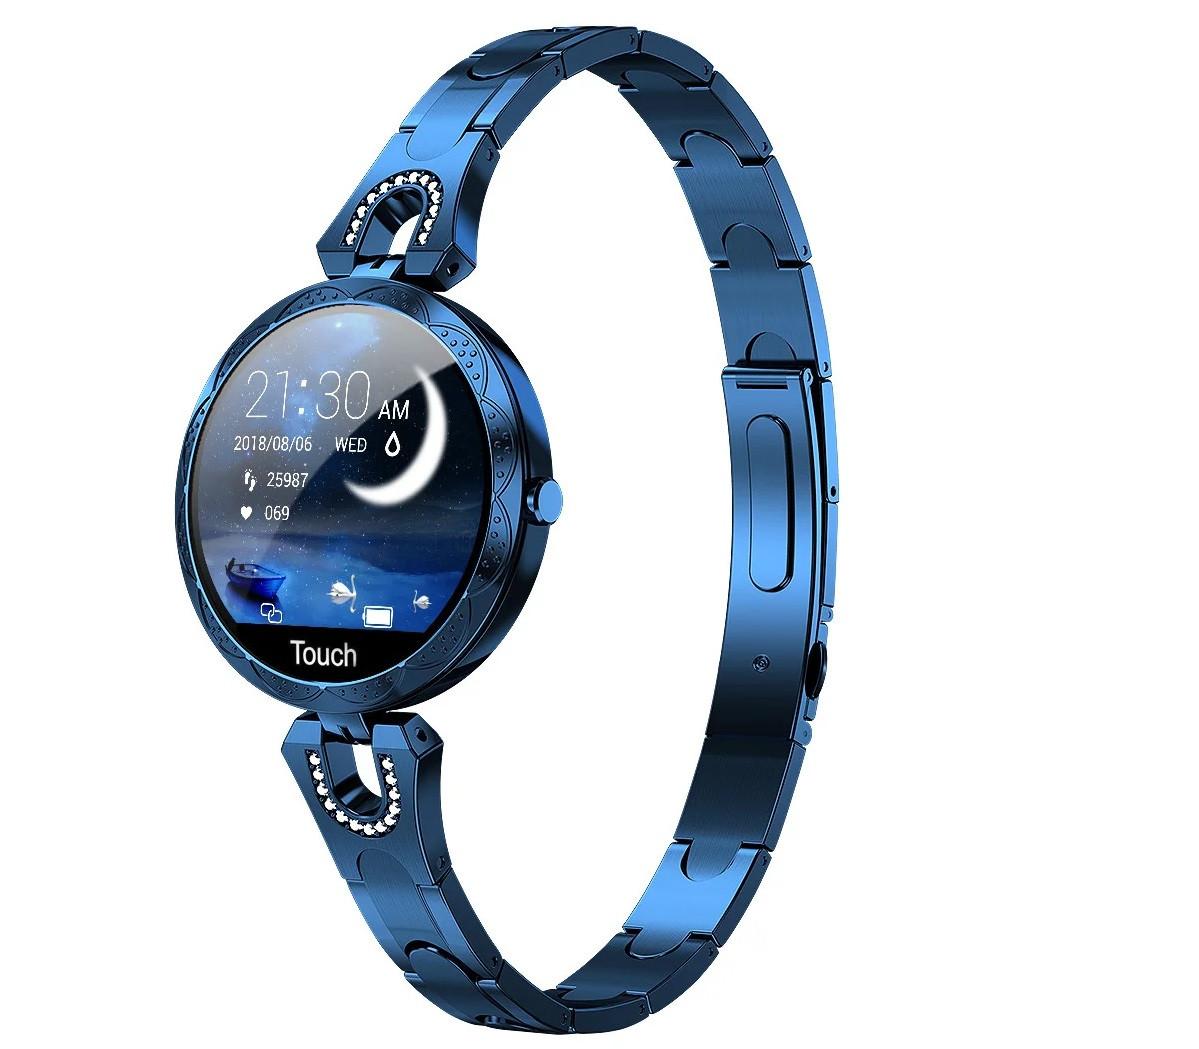 Жіночі розумні фітнес годинник Smart band Colmi AK15 Blue